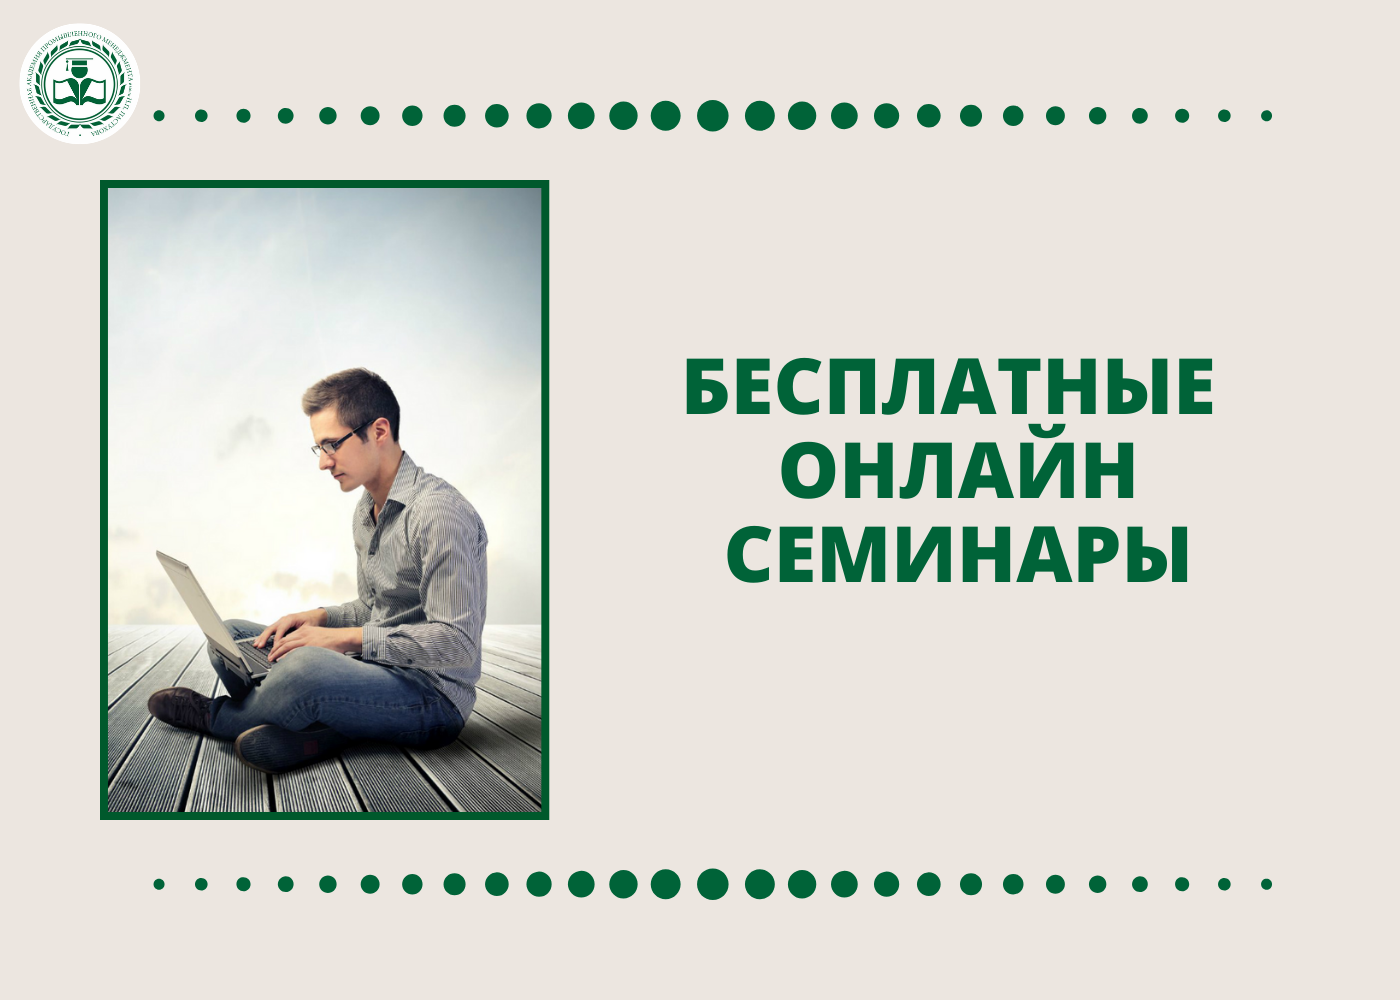 Бесплатные онлайн семинары